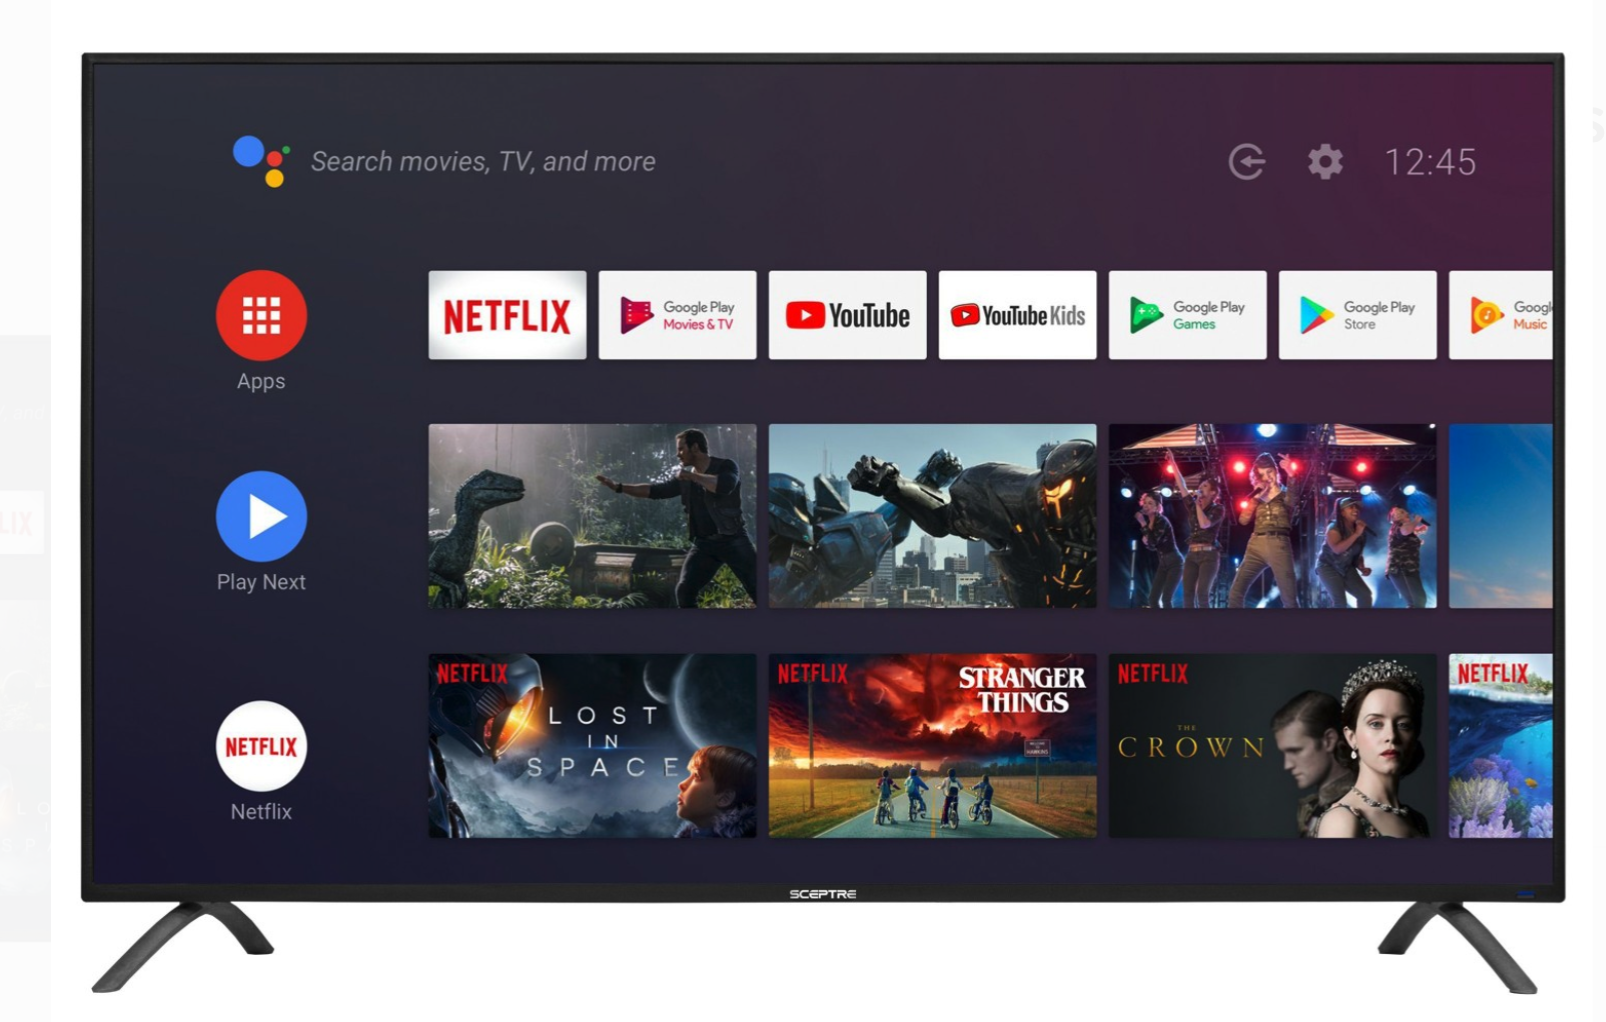 Sceptre 50-inch TV Android TV, best tvs under $200